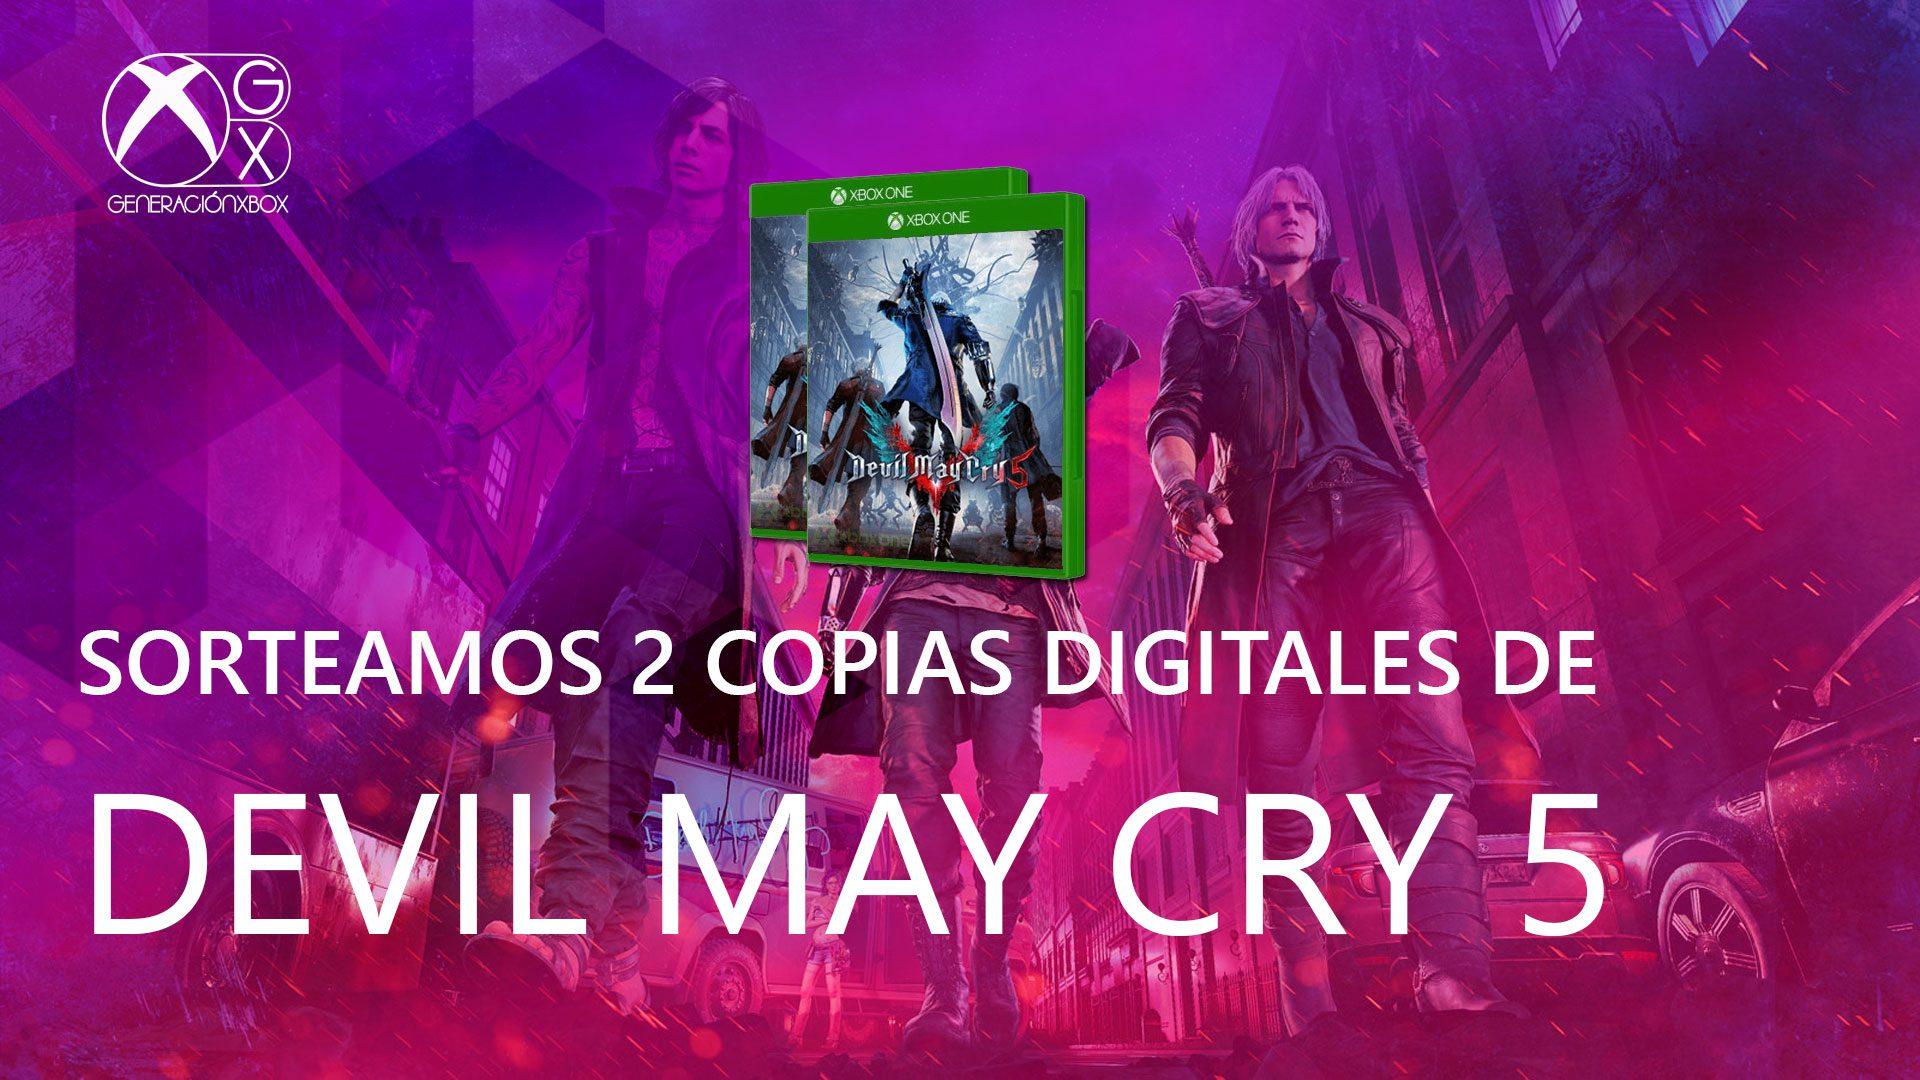 Devil May Cry 5 sorteo